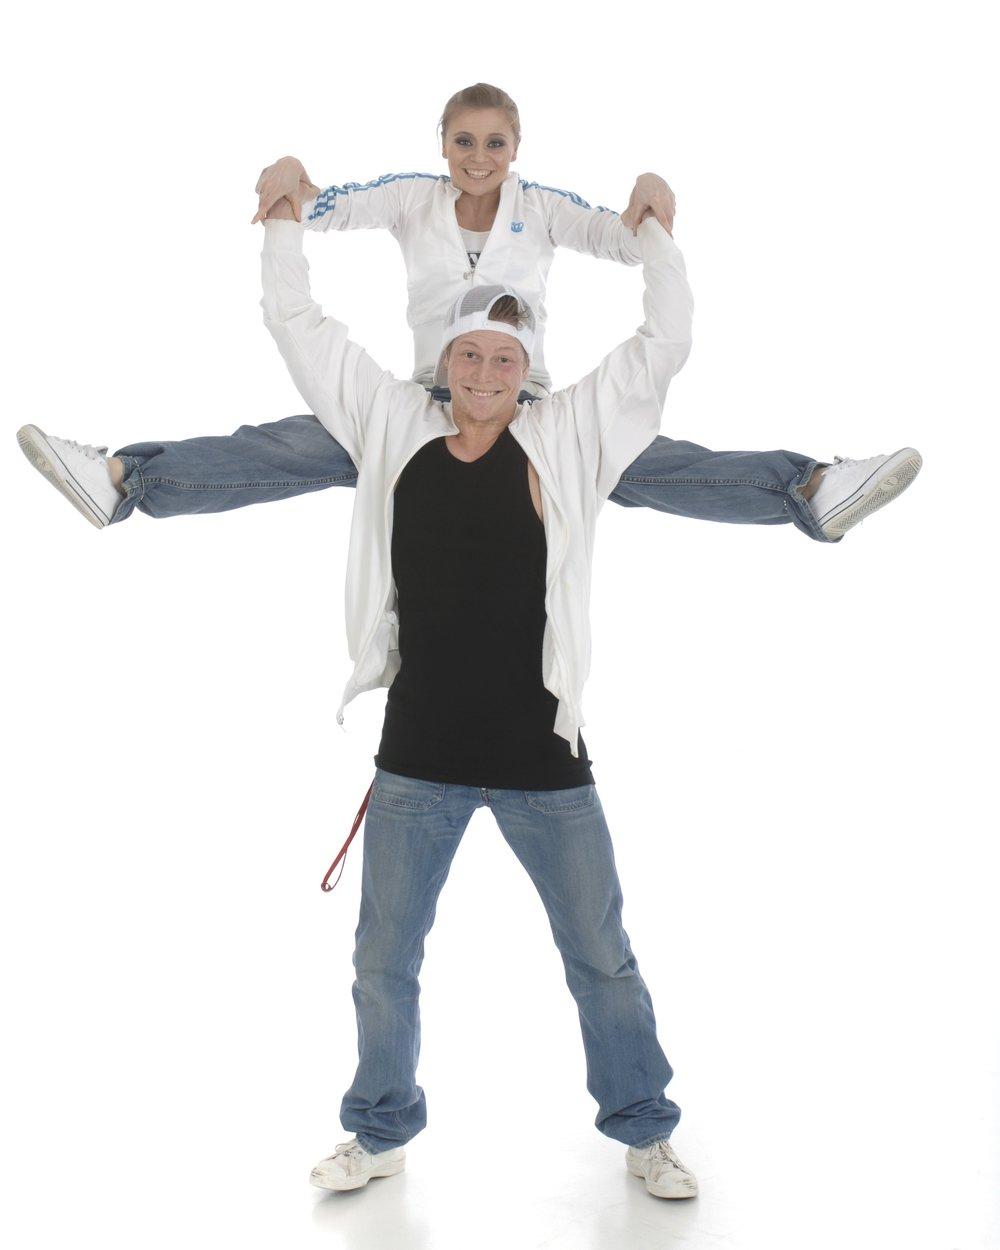 Ole Petter og Marit er instruktører i bl.a. HIP HOP, streetjazz, showdans og breaking